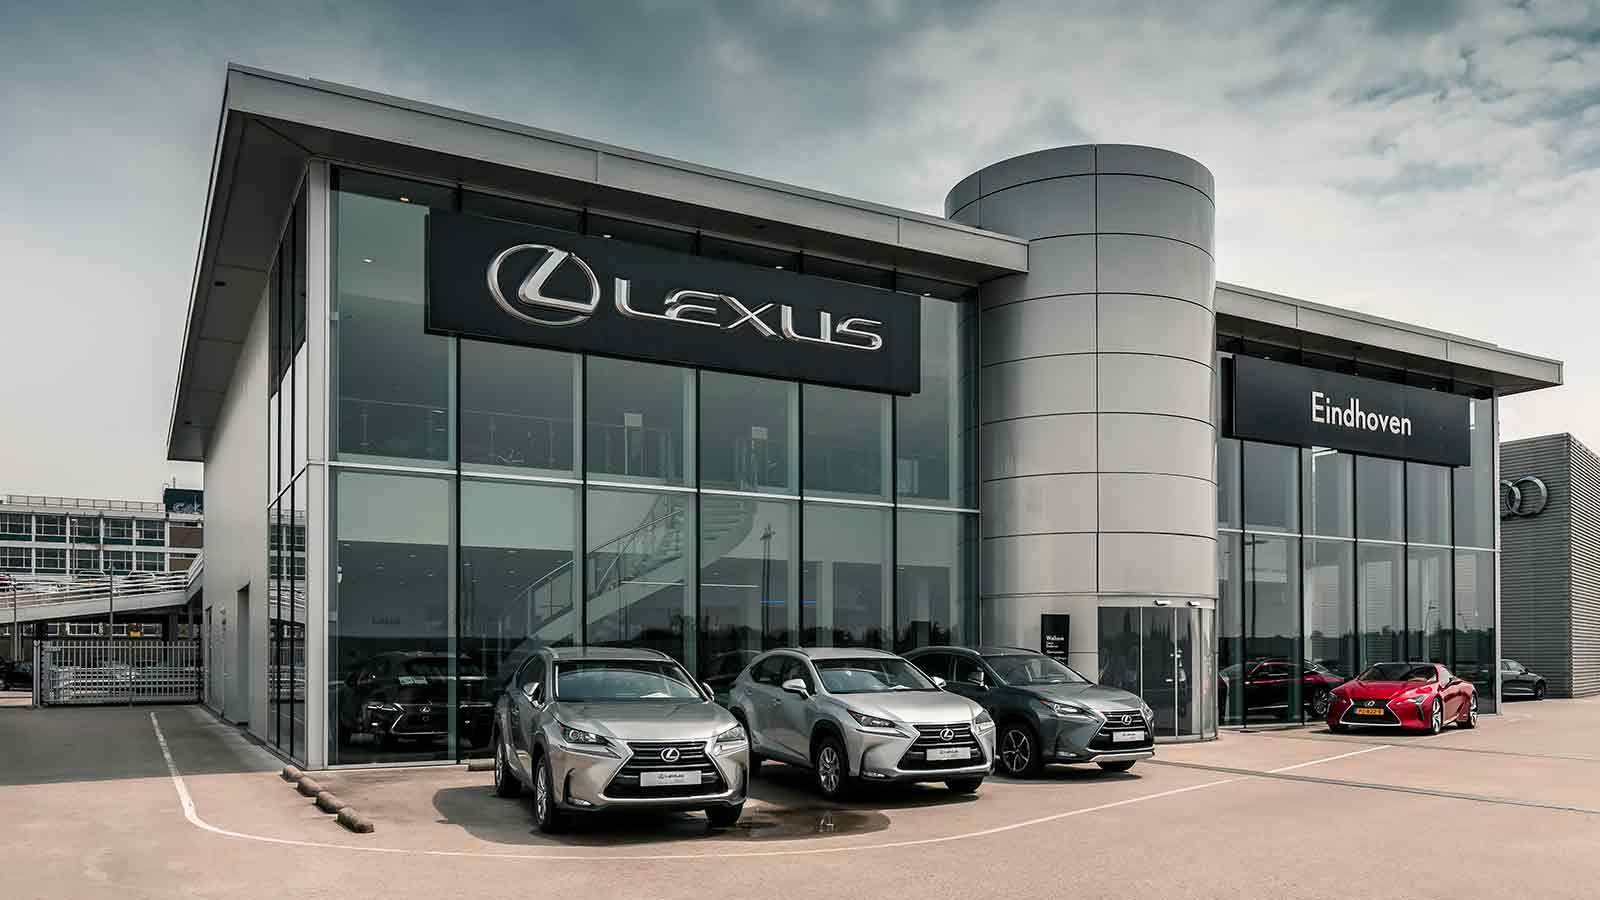 Louwman Lexus Eindhoven